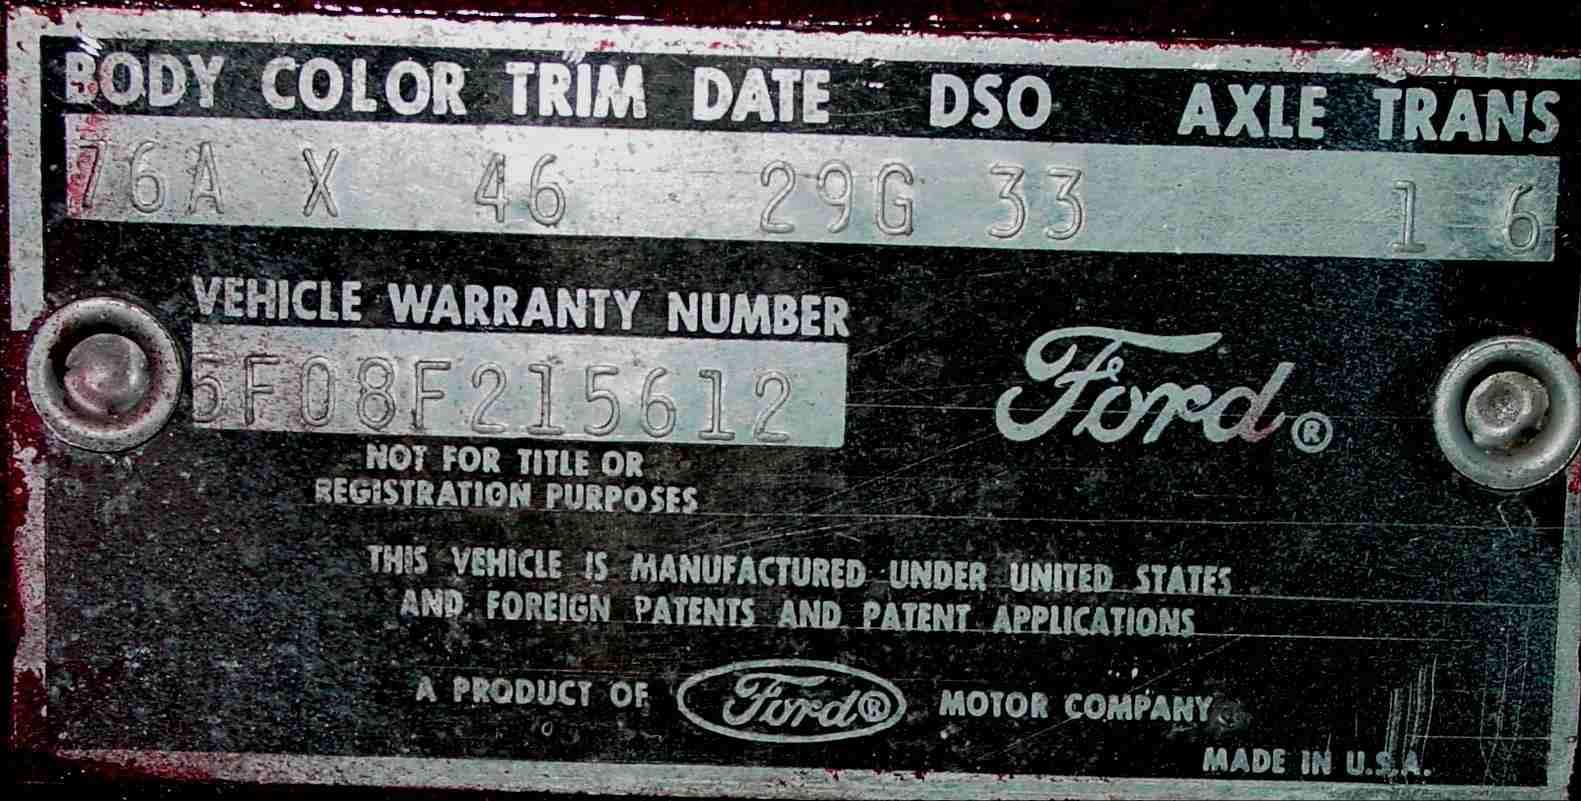 Marti Auto Works - Concourse Quality, Hobbyist Price